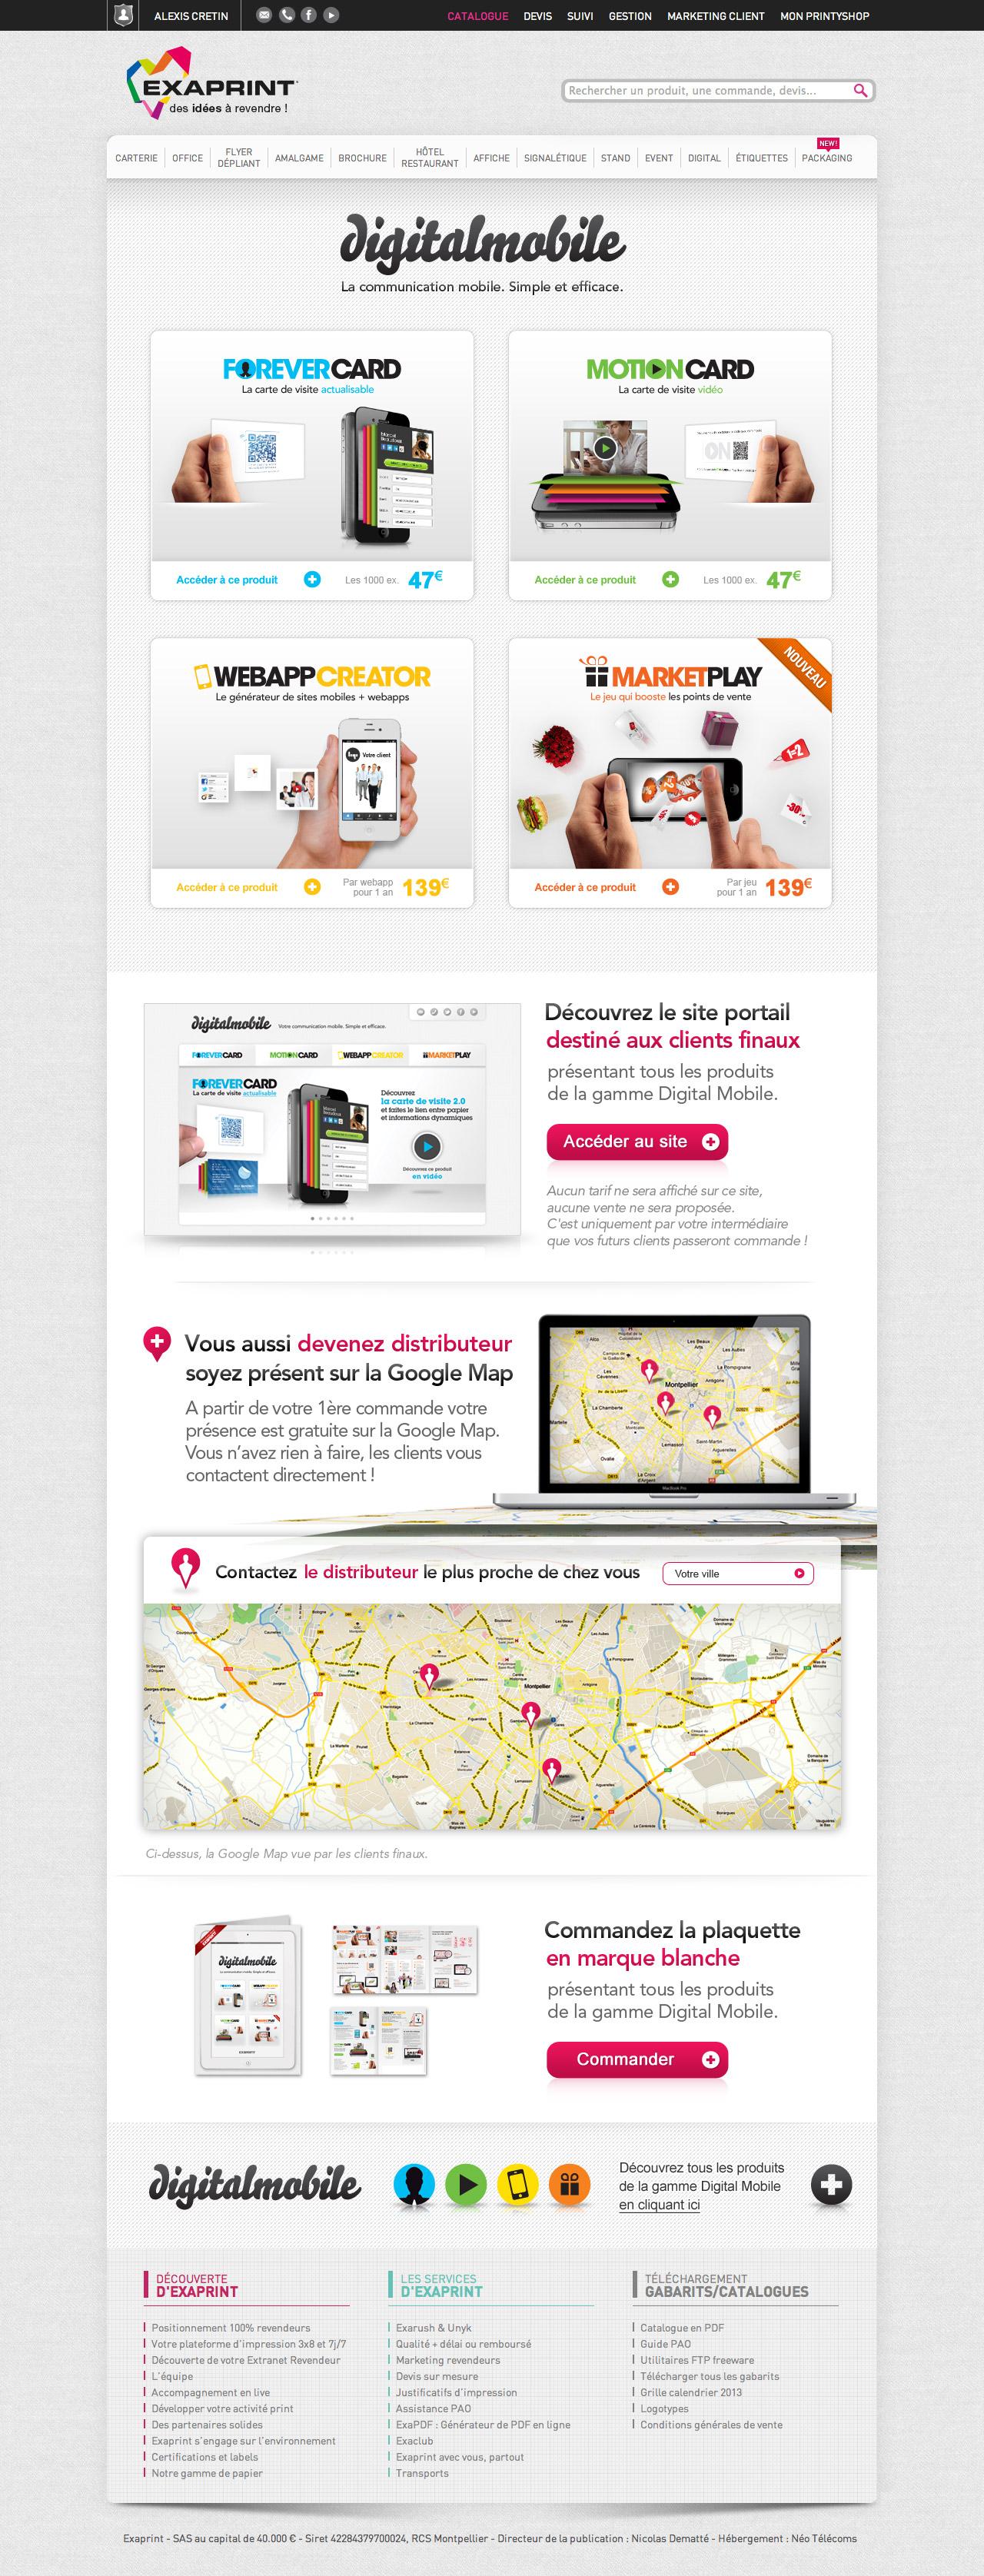 exaprint-digitalmobile-site-exaprint-creation-communication-caconcept-alexis-cretin-graphiste